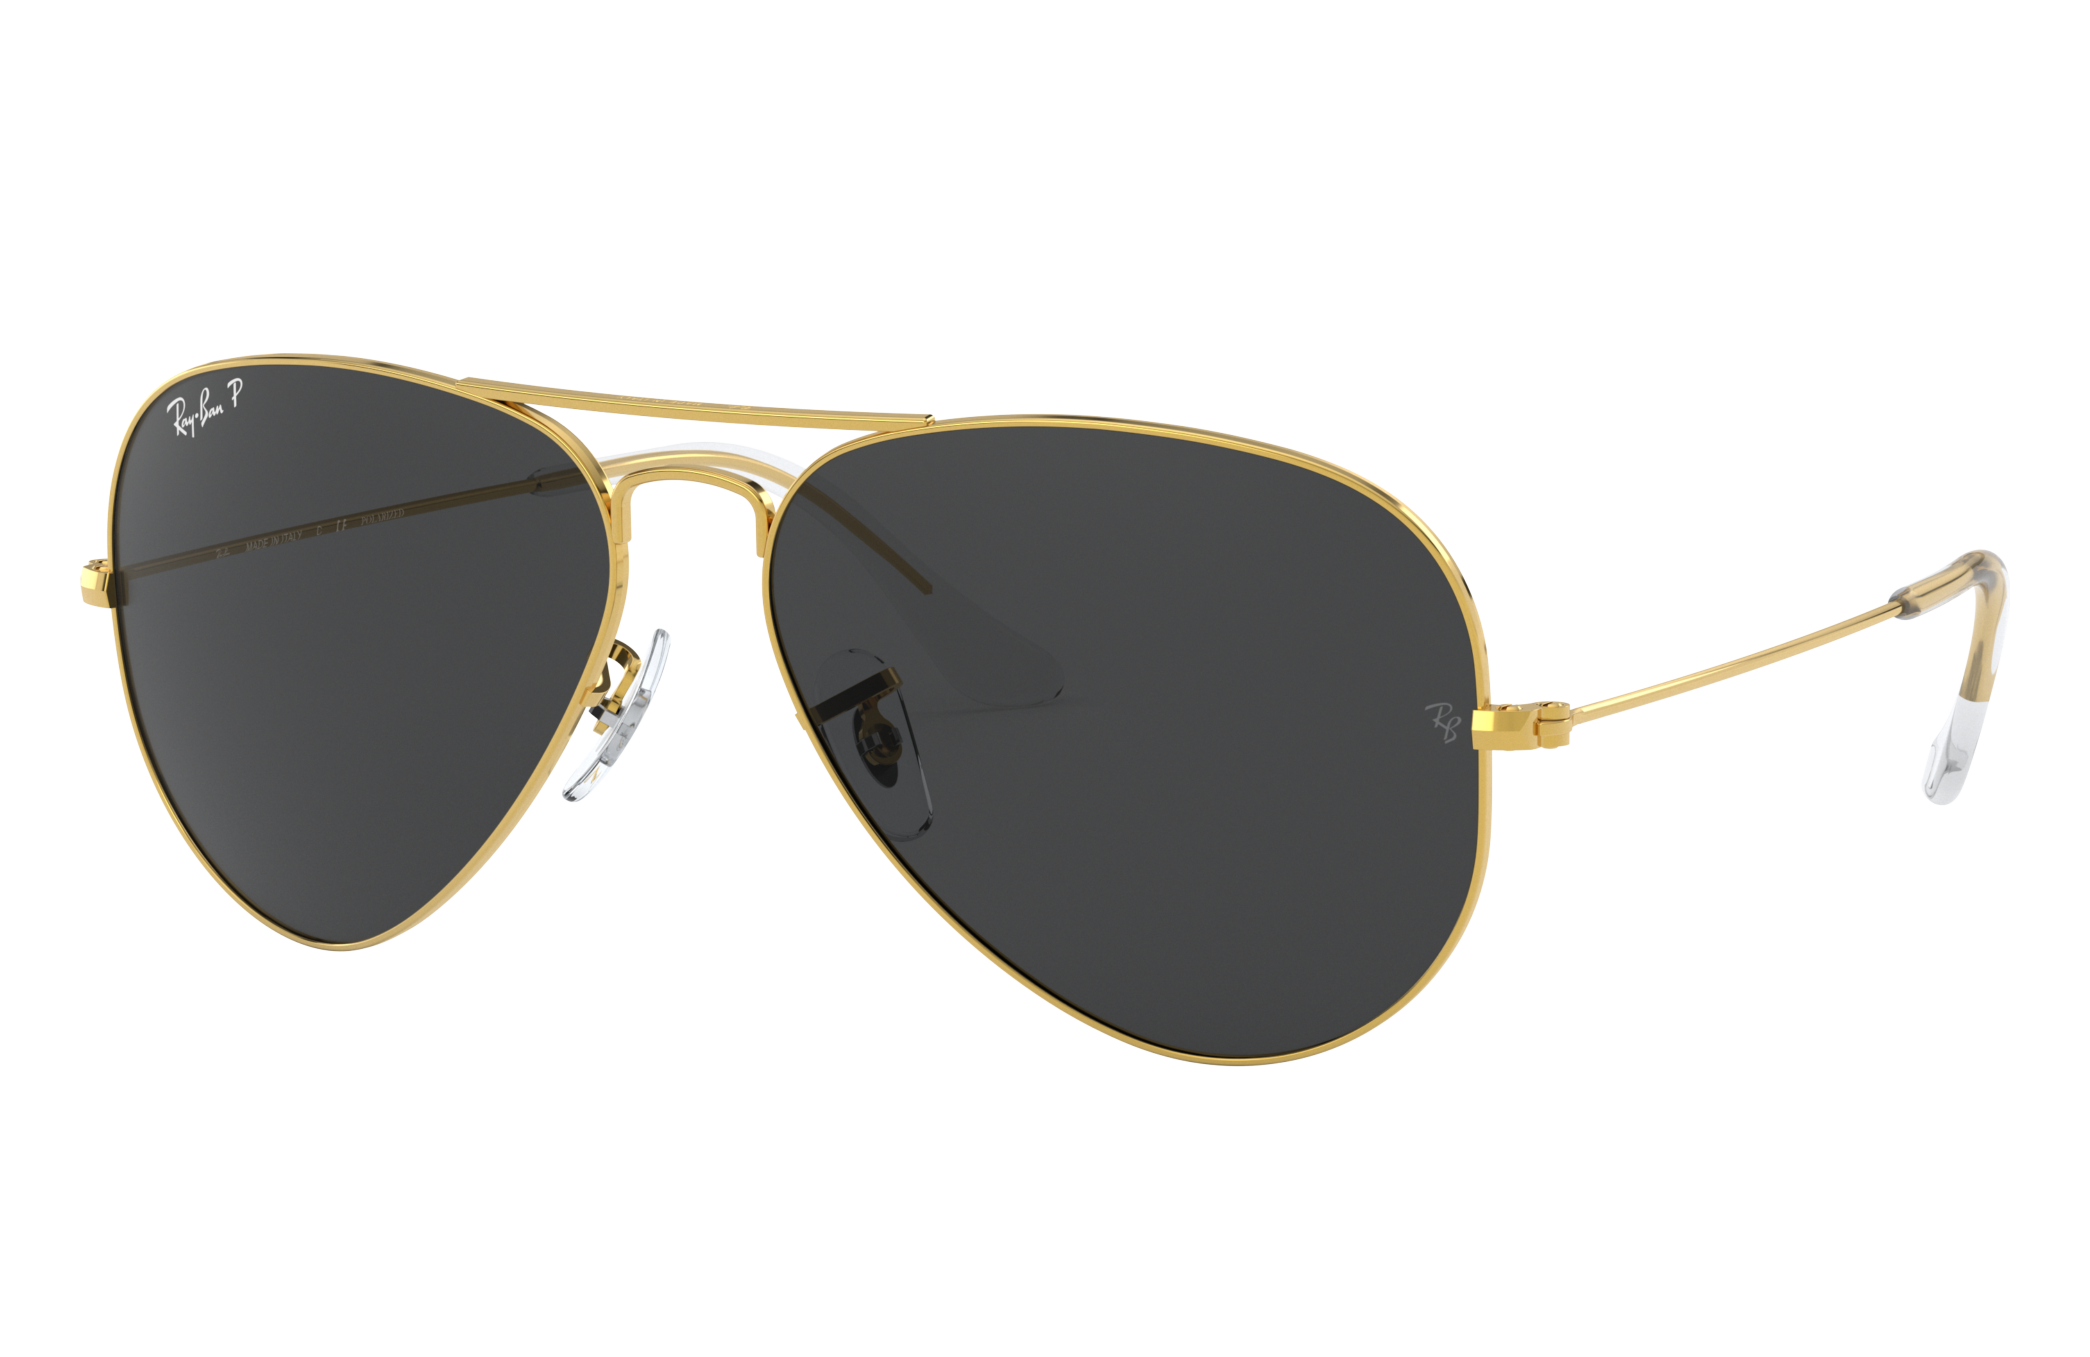 Ray Ban Aviator Classic Gold, Polarized Black Lenses RB3025